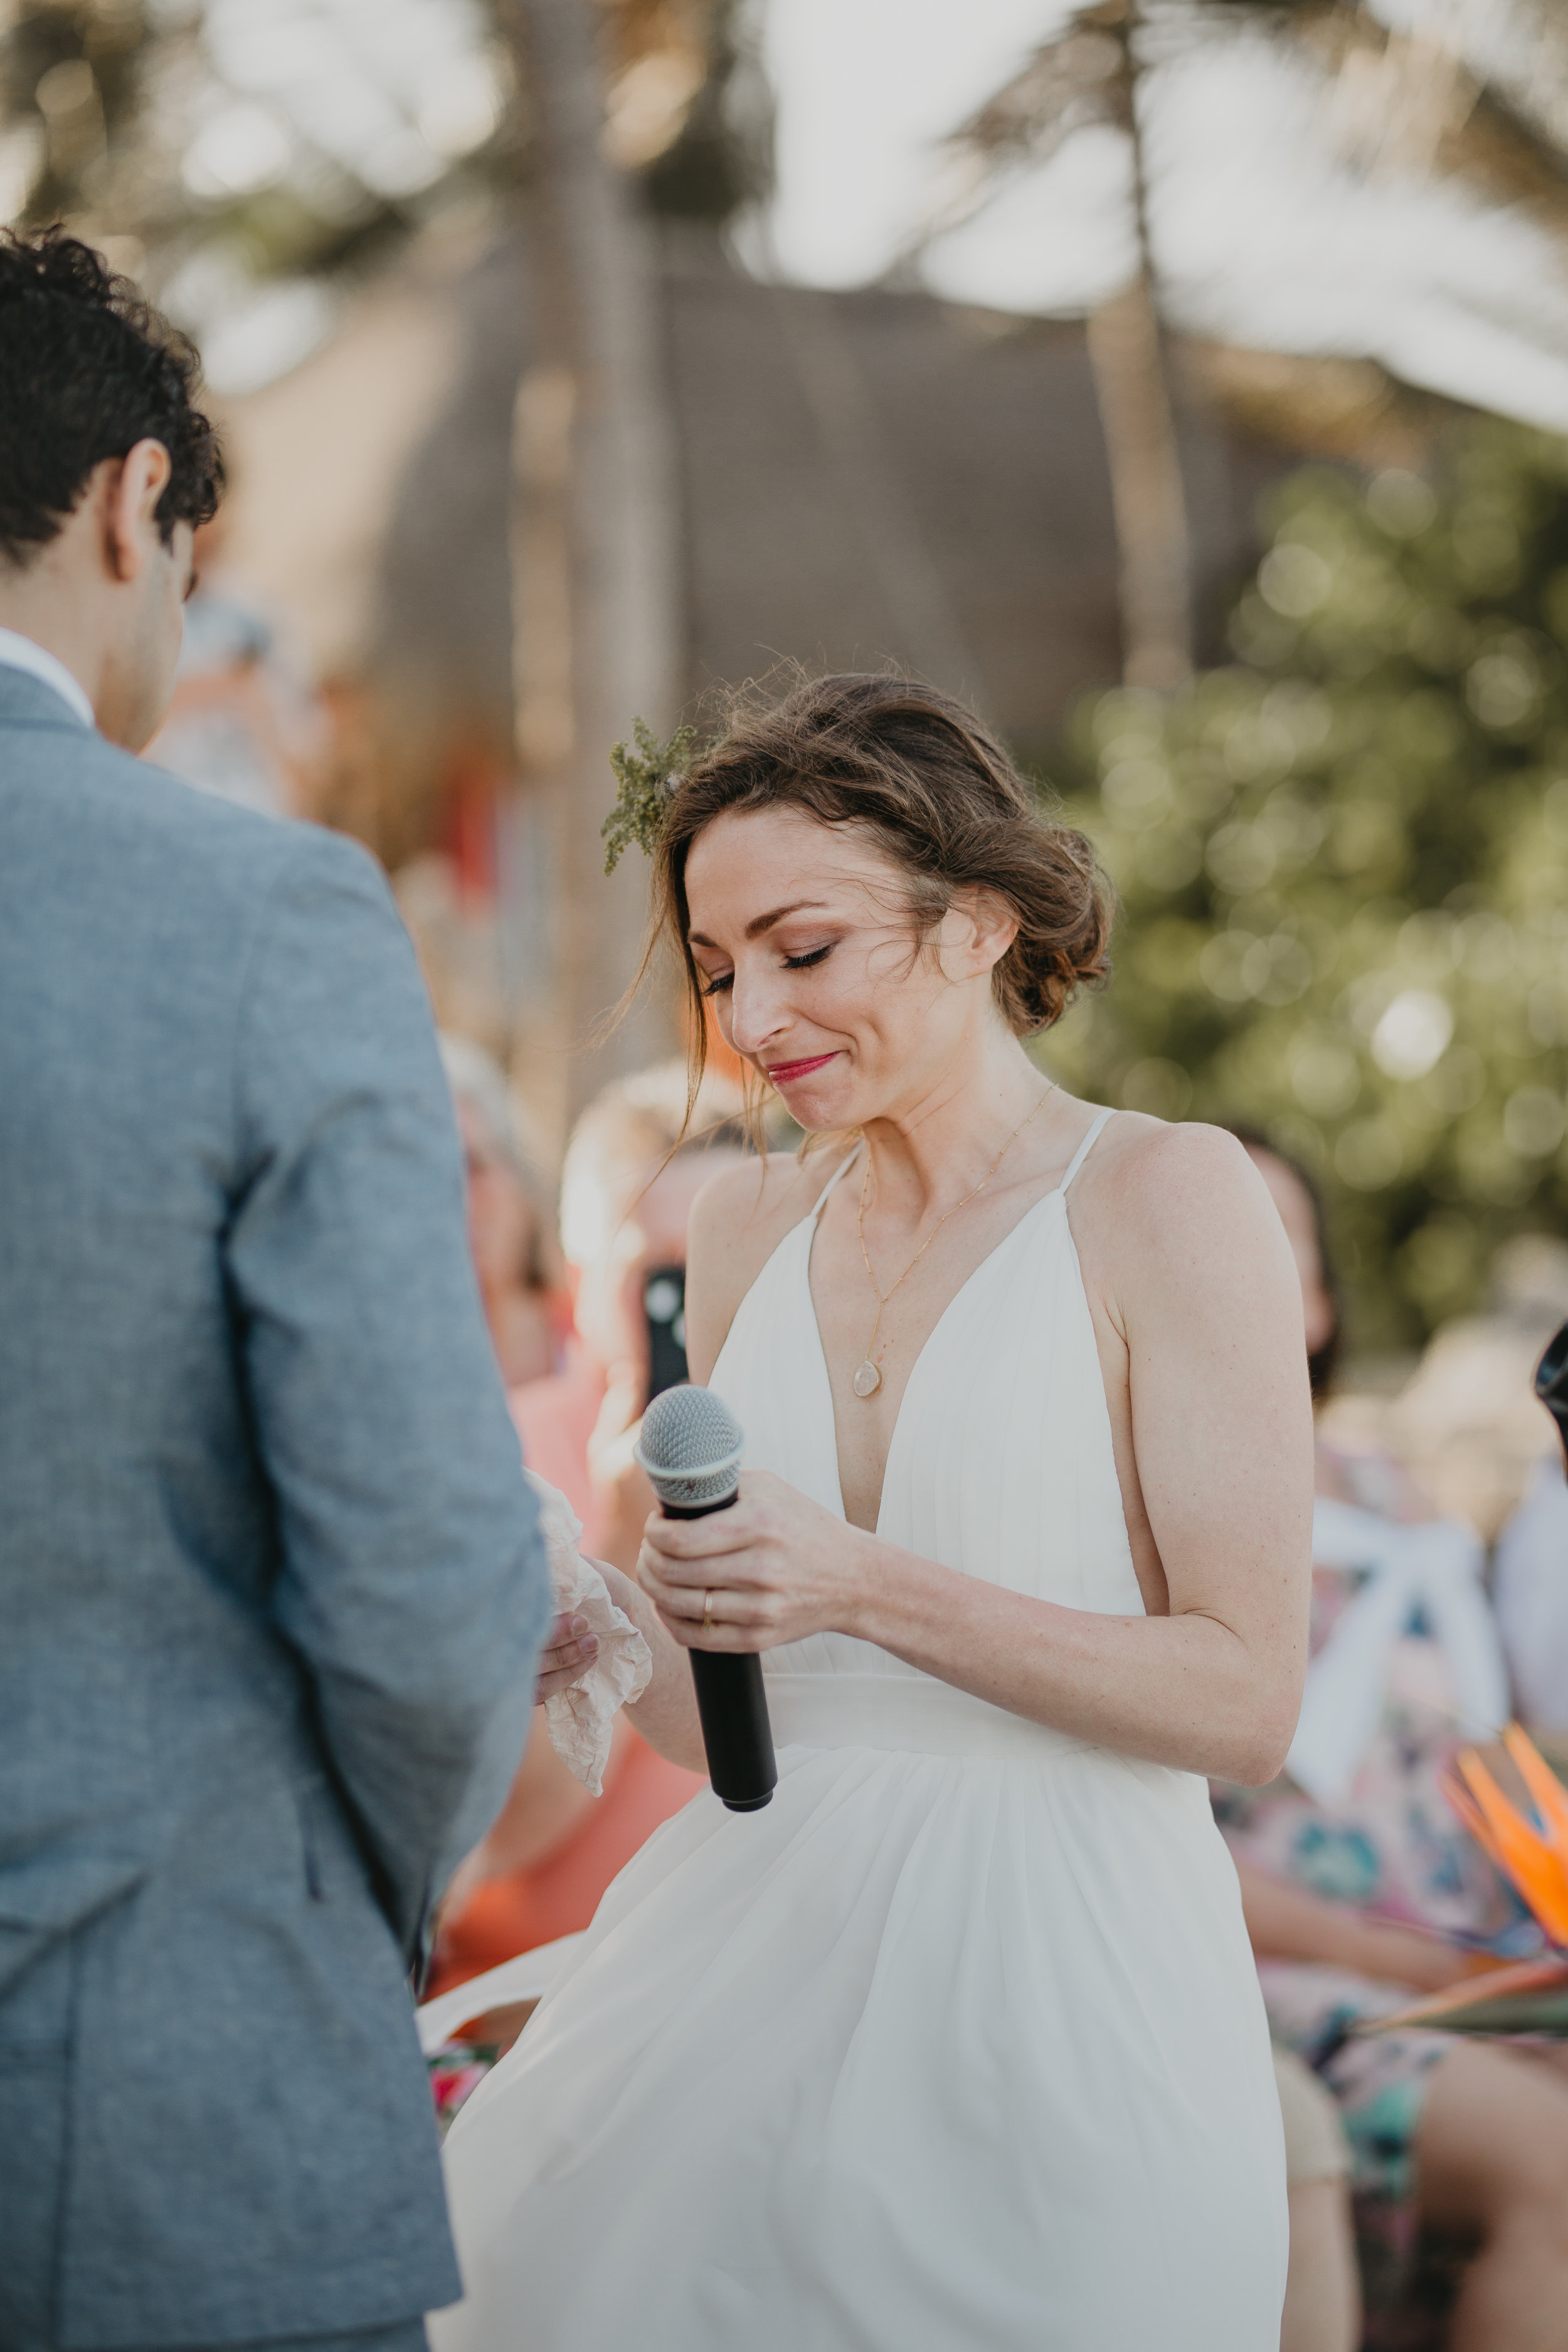 Nicole-Daacke-Photography-beachfront-akumal-destionation-wedding-tulum-mexico-elopement-photographer-destination-wedding-inspiration-sunset-champagne-pop-boho-bride-ocean-tropical-bohemian-tulum-wedding-photos-163.jpg